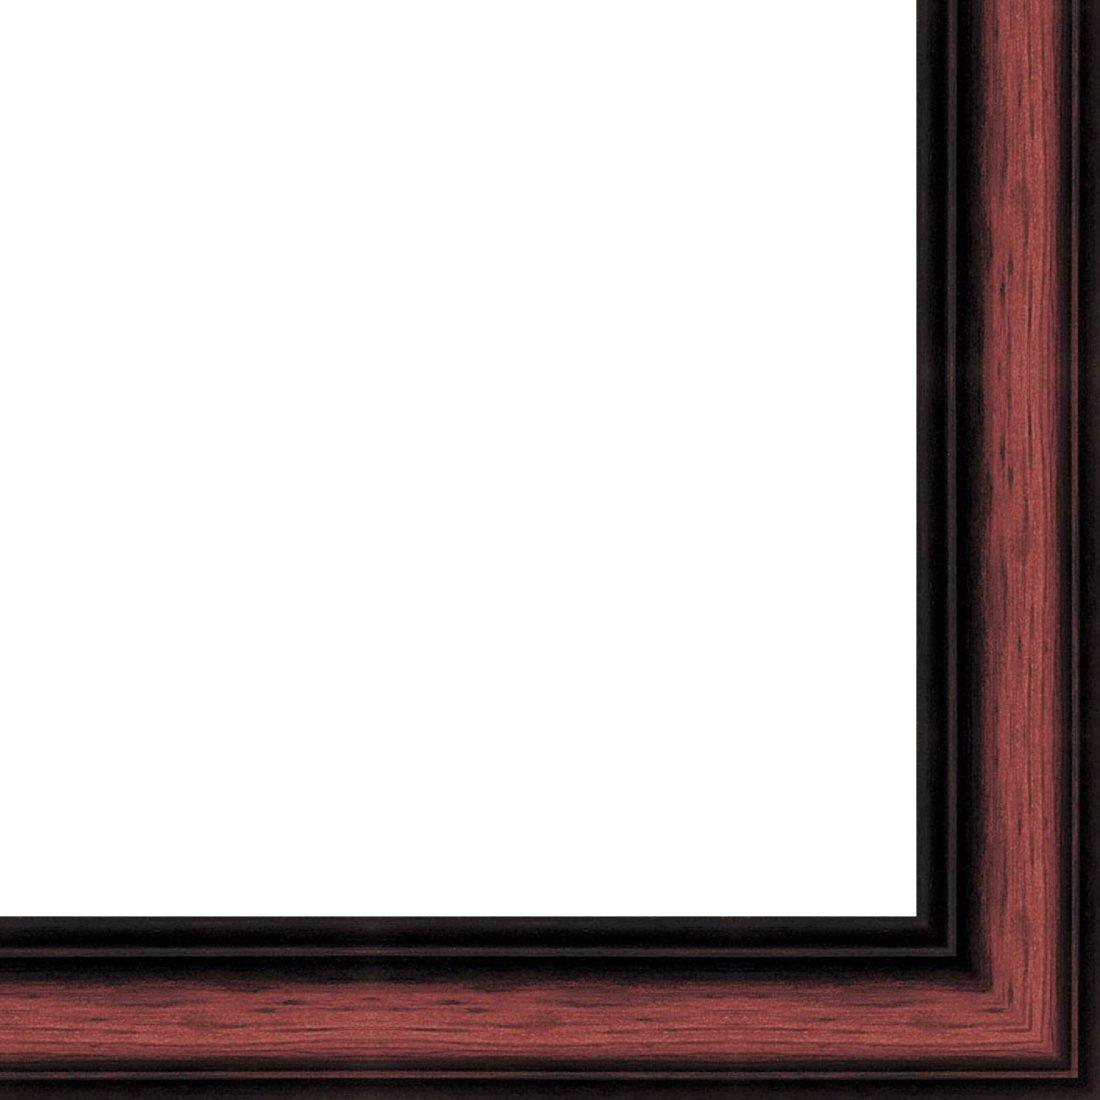 Picture Frame Moulding (Wood) 18ft bundle - Traditional Mahogany Finish - 1'' width - 1/4'' rabbet depth